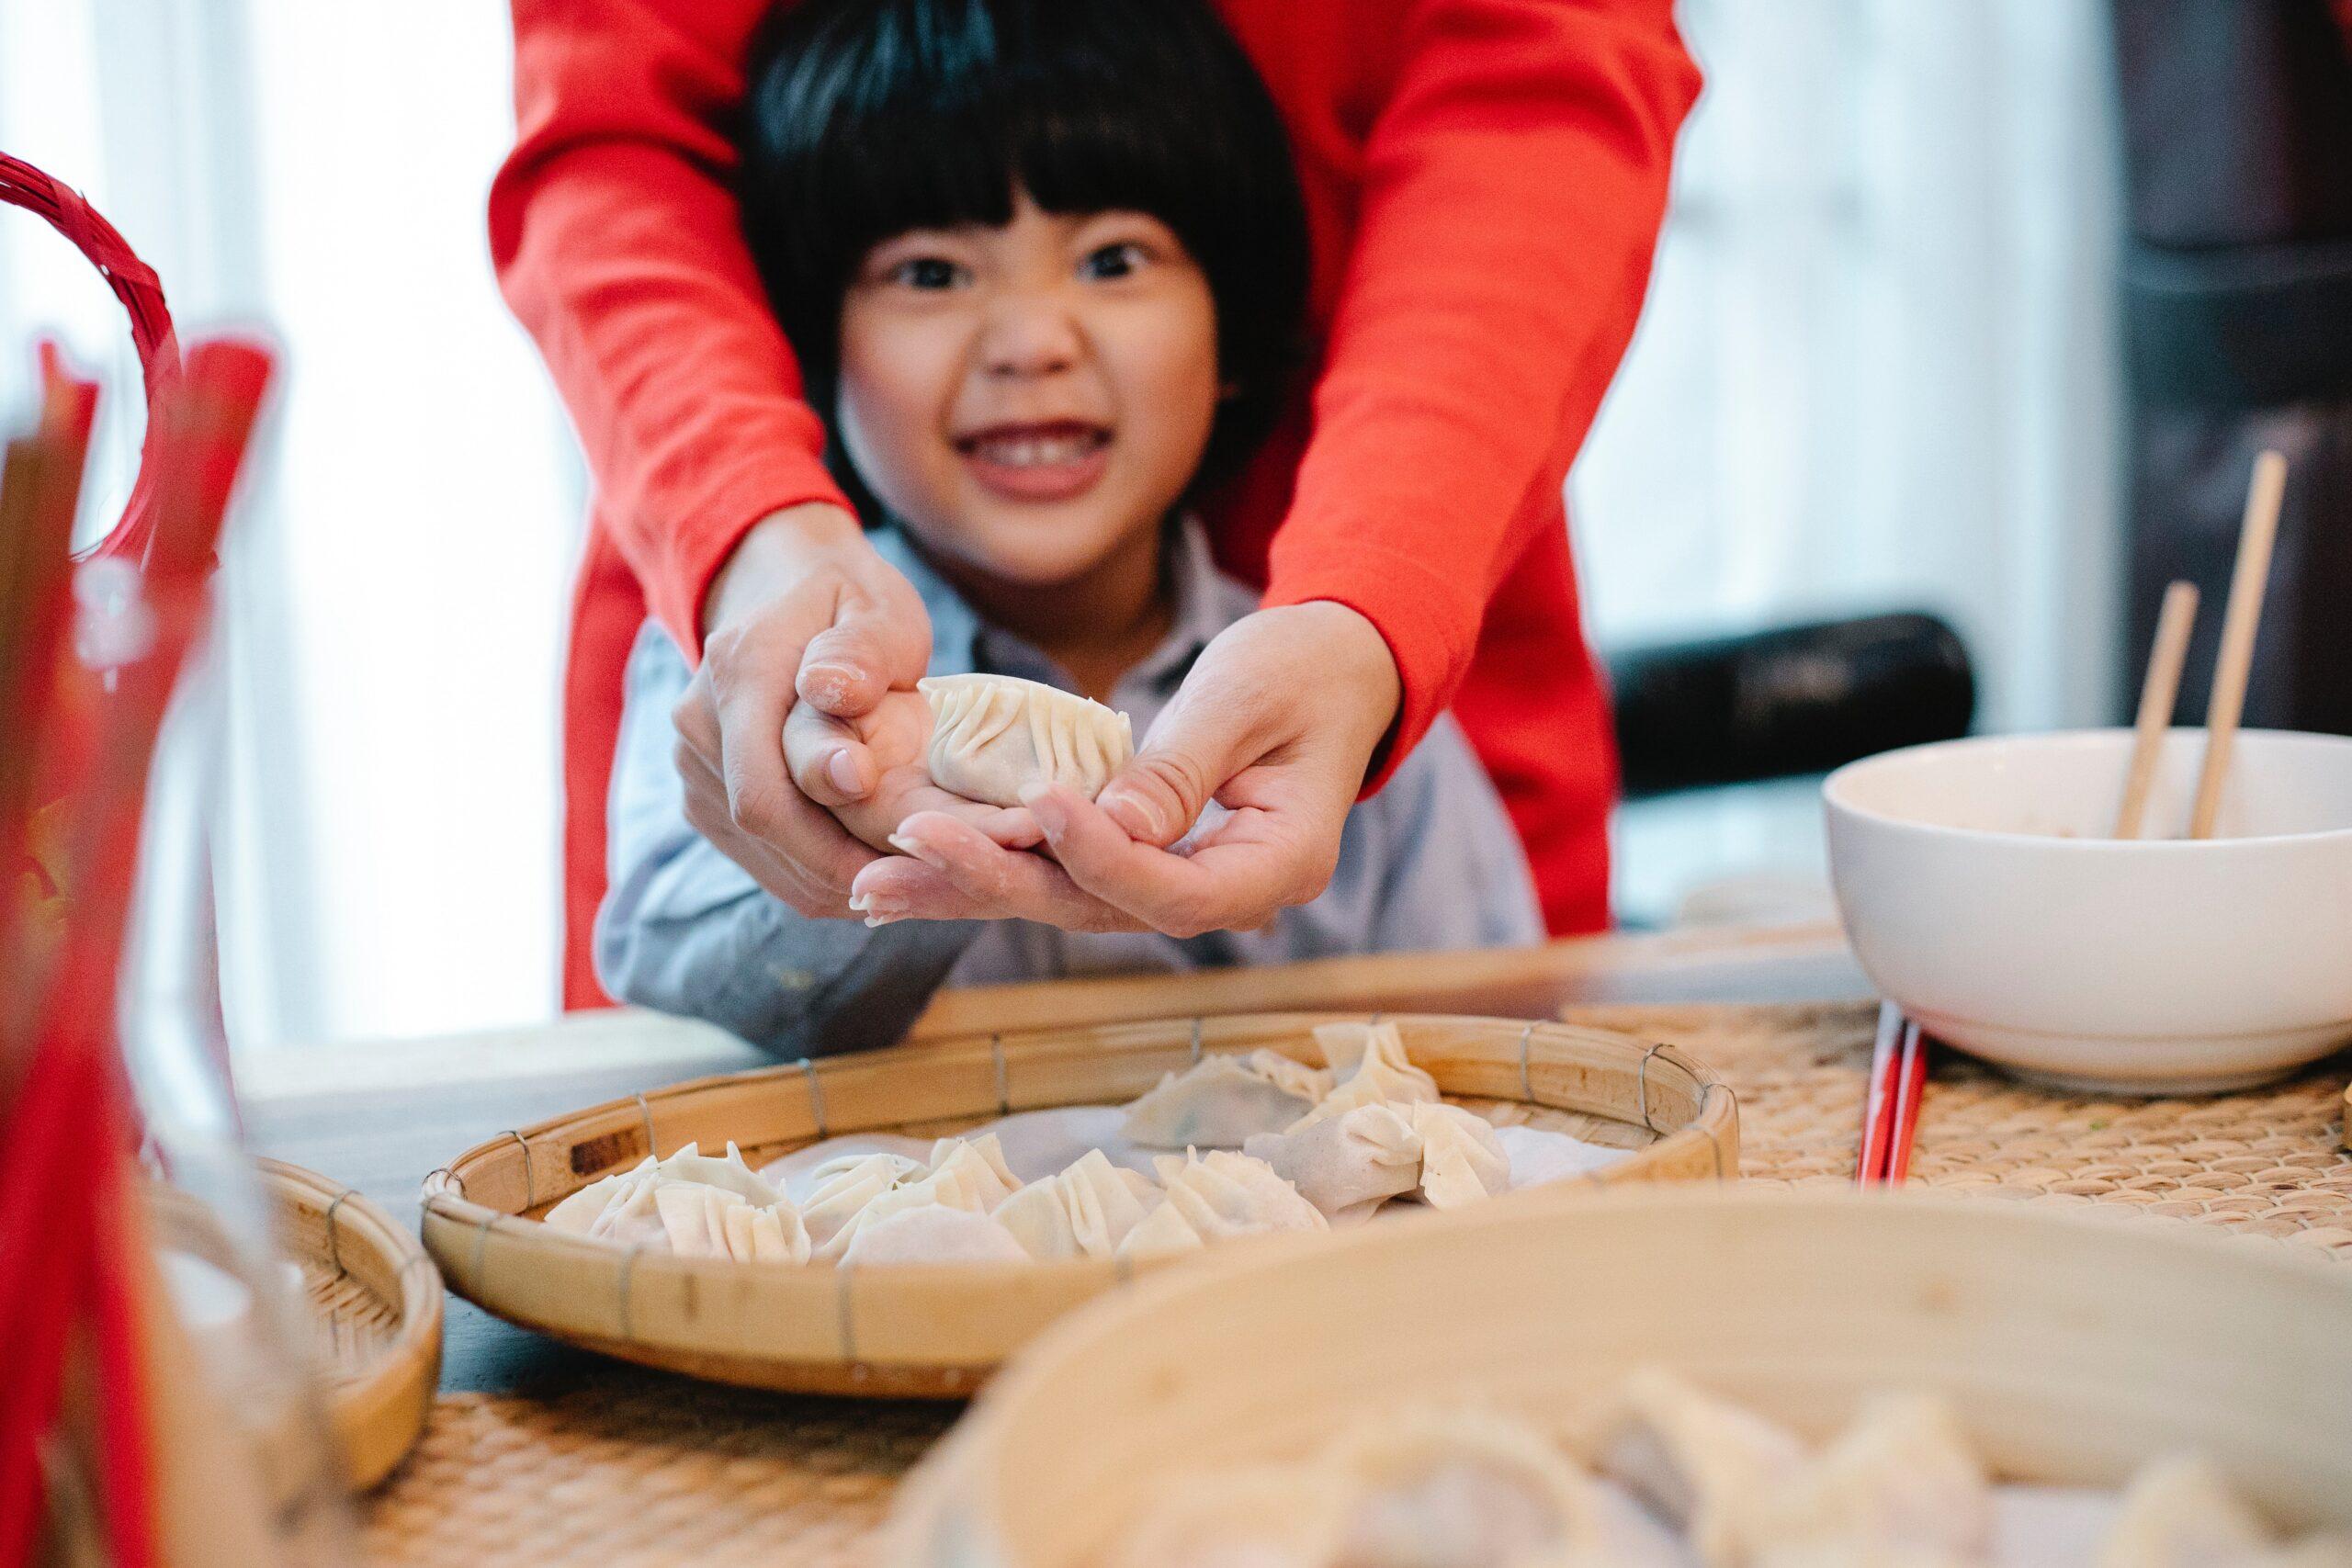 Little boy helping prepare food in the kitchen